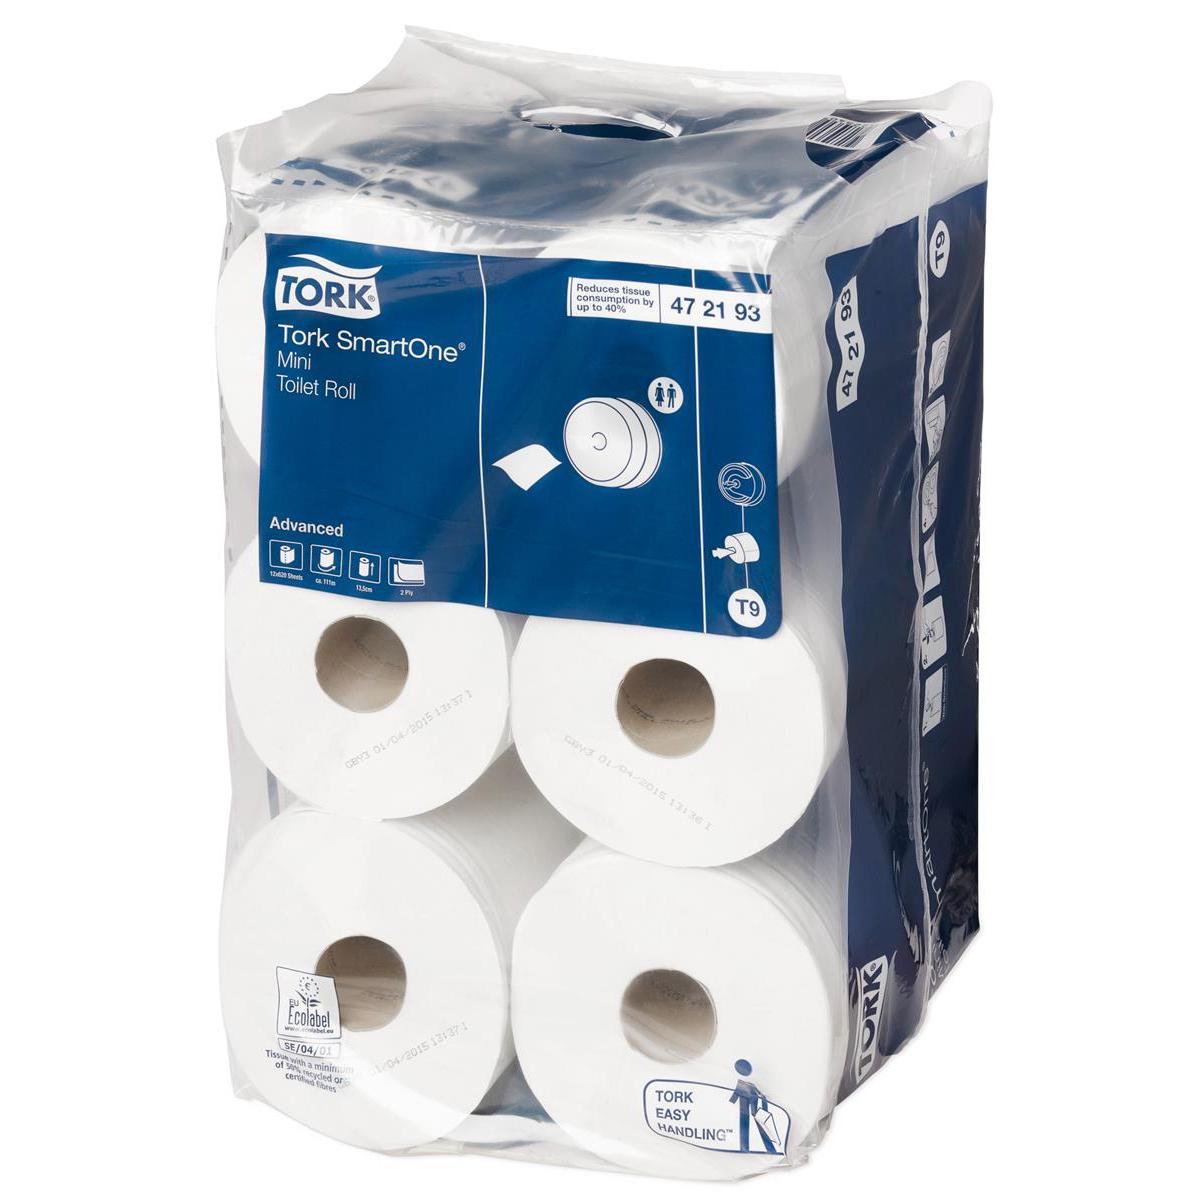 Tork Toilet Roll SmartOne Mini 2-ply 134x180mm 620 Sheets White Ref 472193 [Pack 12]